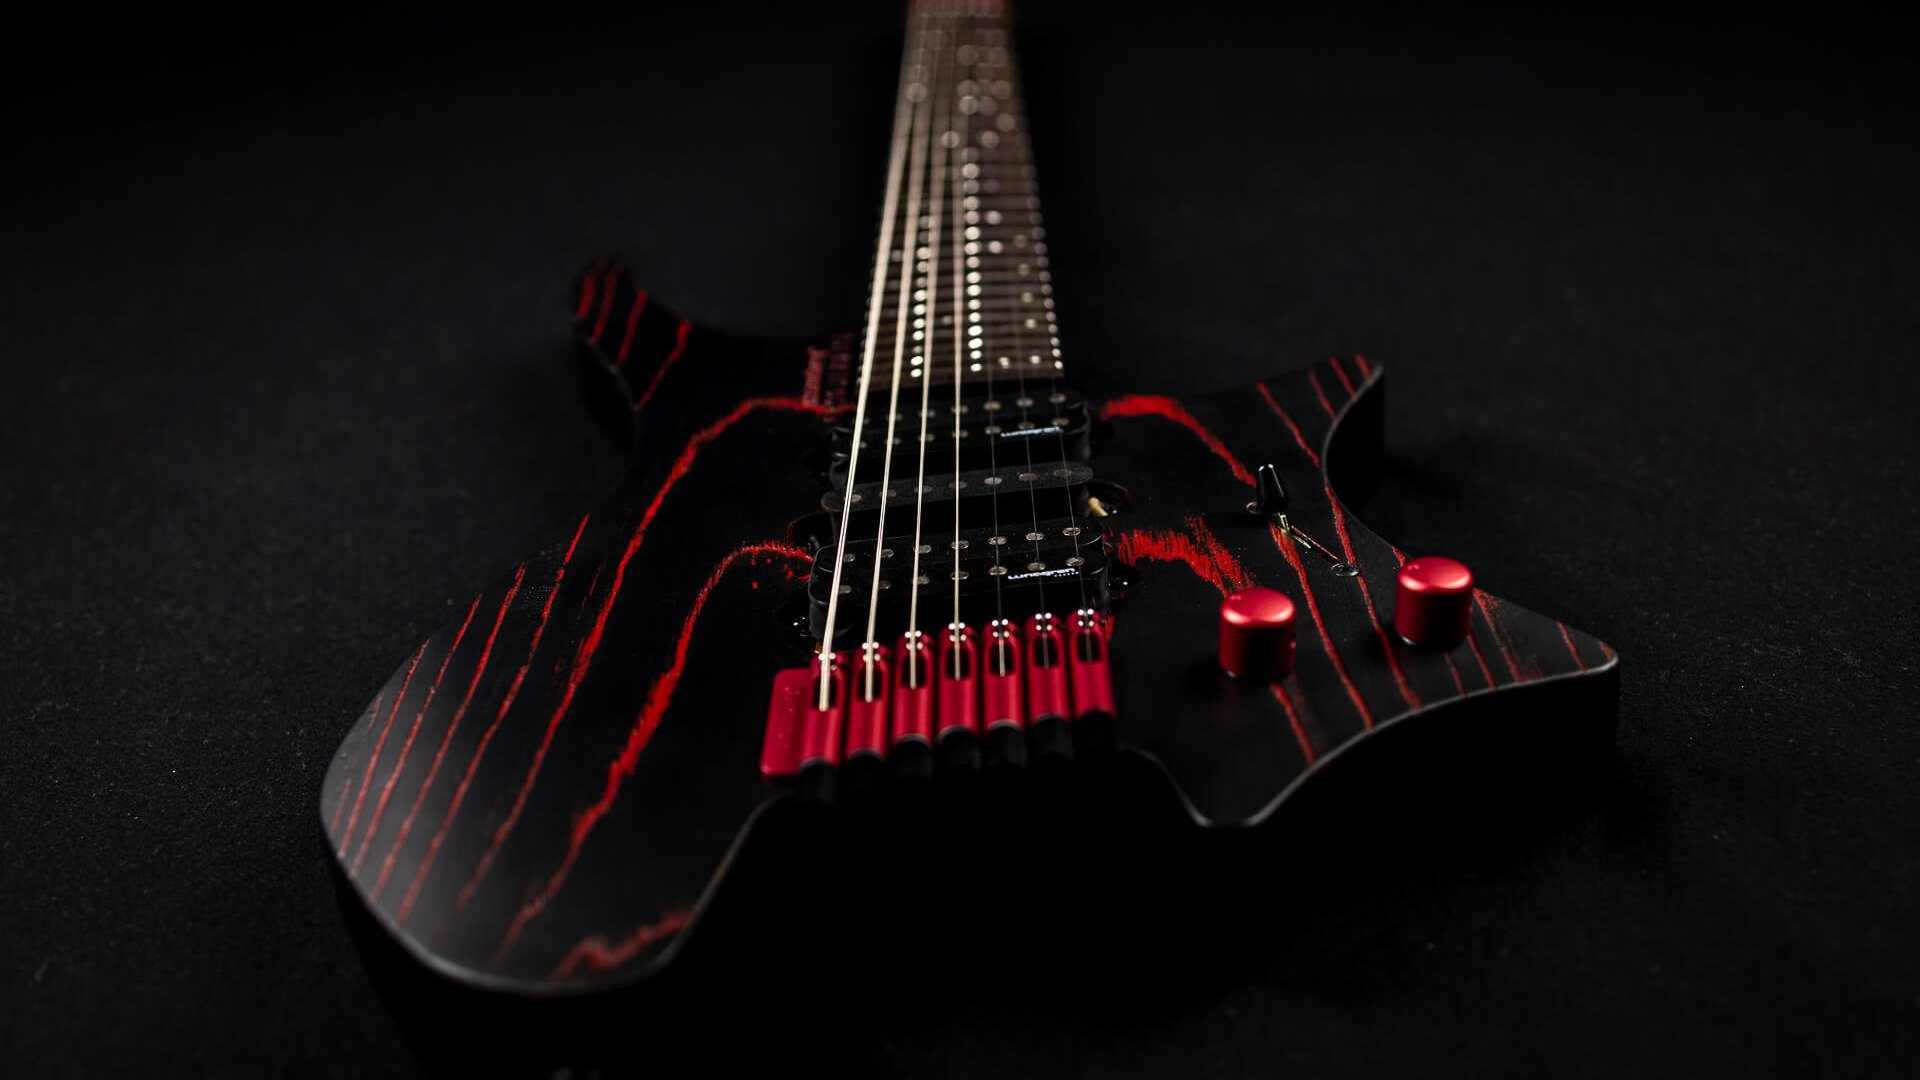 Strandberg Singularity Headless guitar